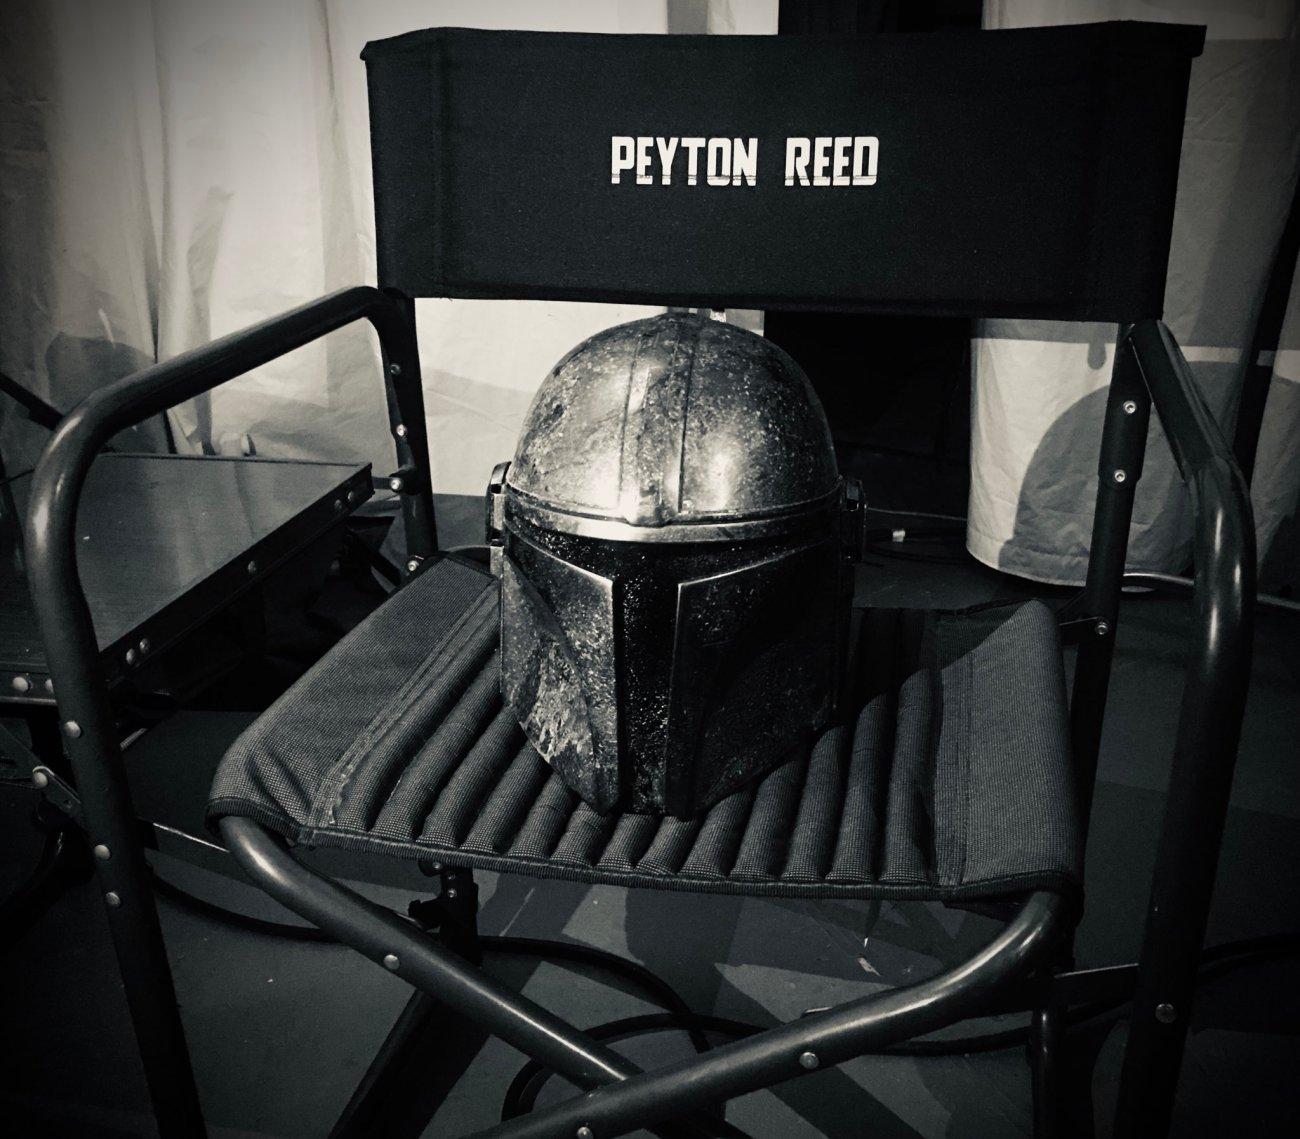 La silla del director Payton Reed en el set de The Mandalorian. Imagen: Peyton Reed Twitter (@MrPeytonReed).